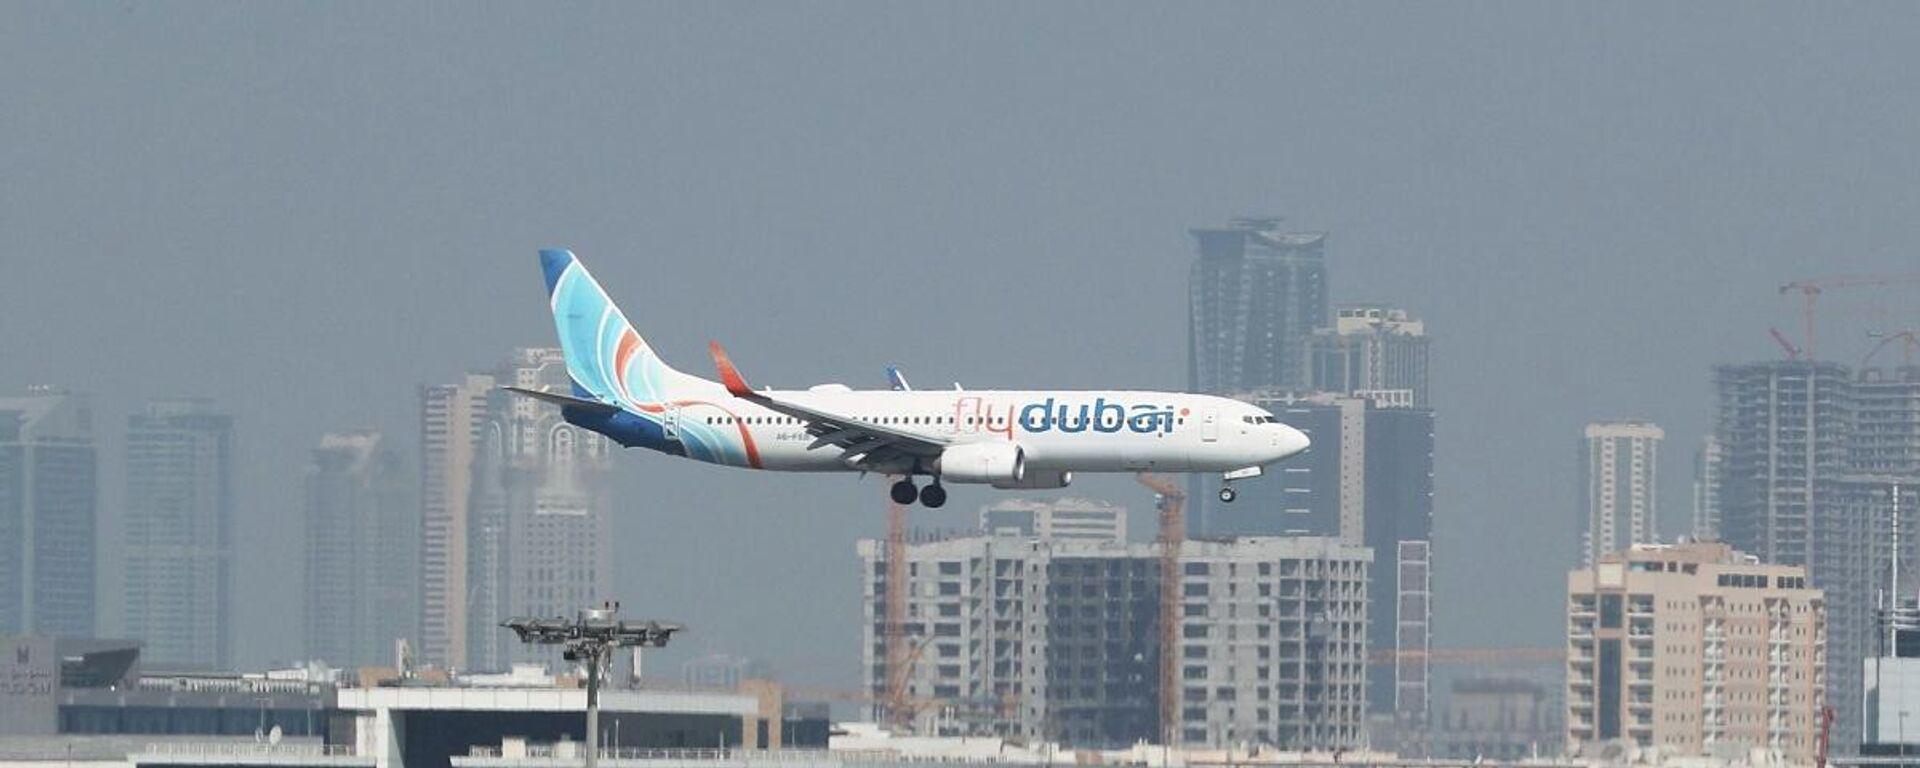 Boeing 737-800 de la aerolínea de los Emiratos Árabes Unidos Fly Dubai  - Sputnik Mundo, 1920, 16.05.2021